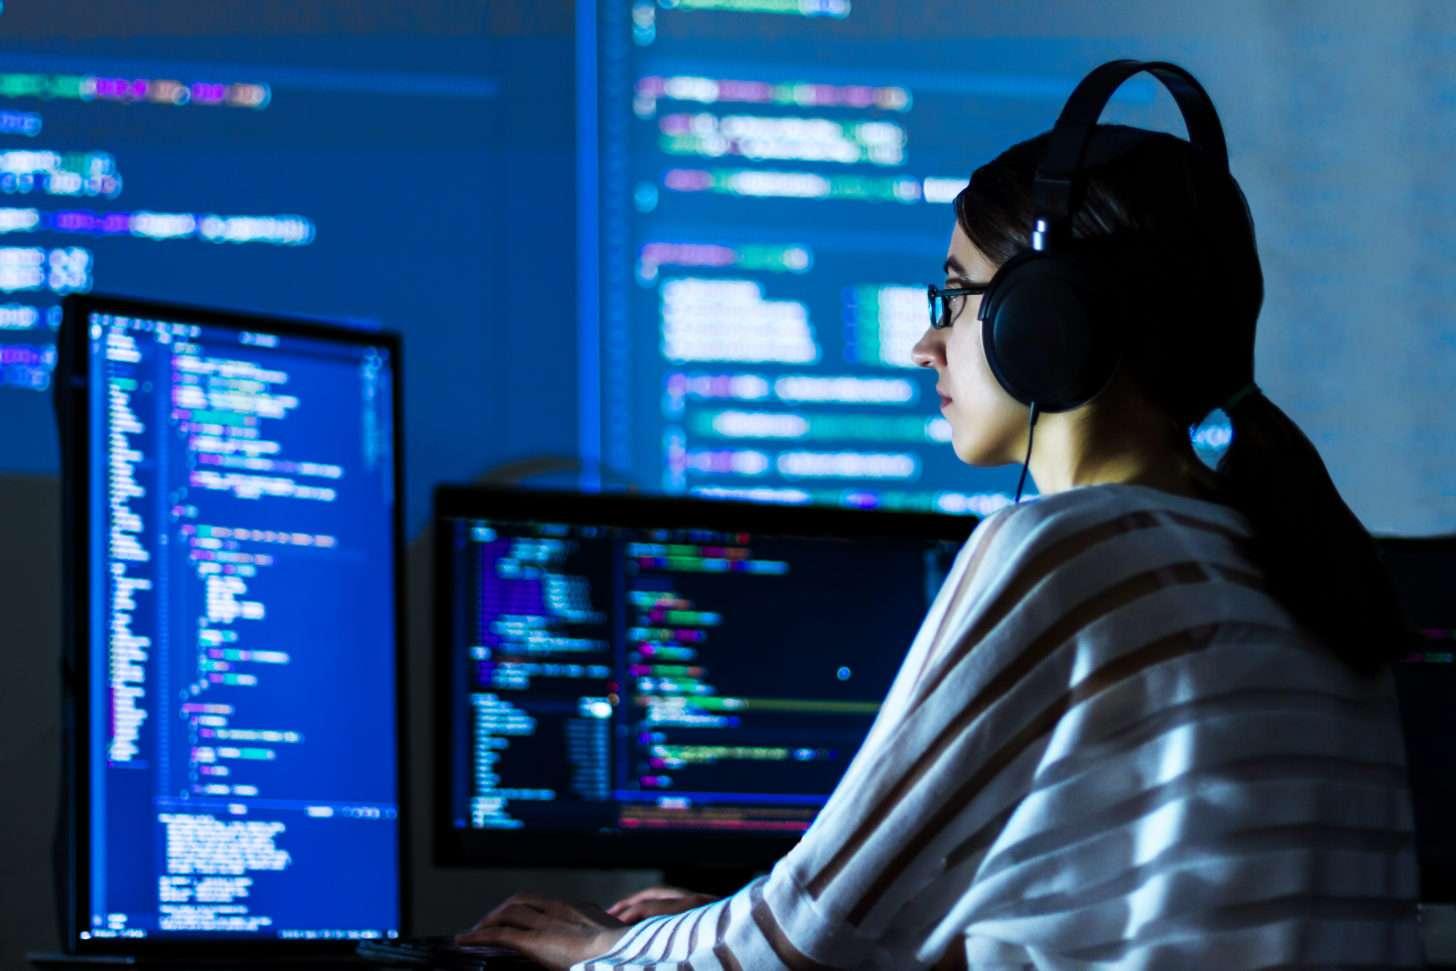 Cybersecurity computer science jobs